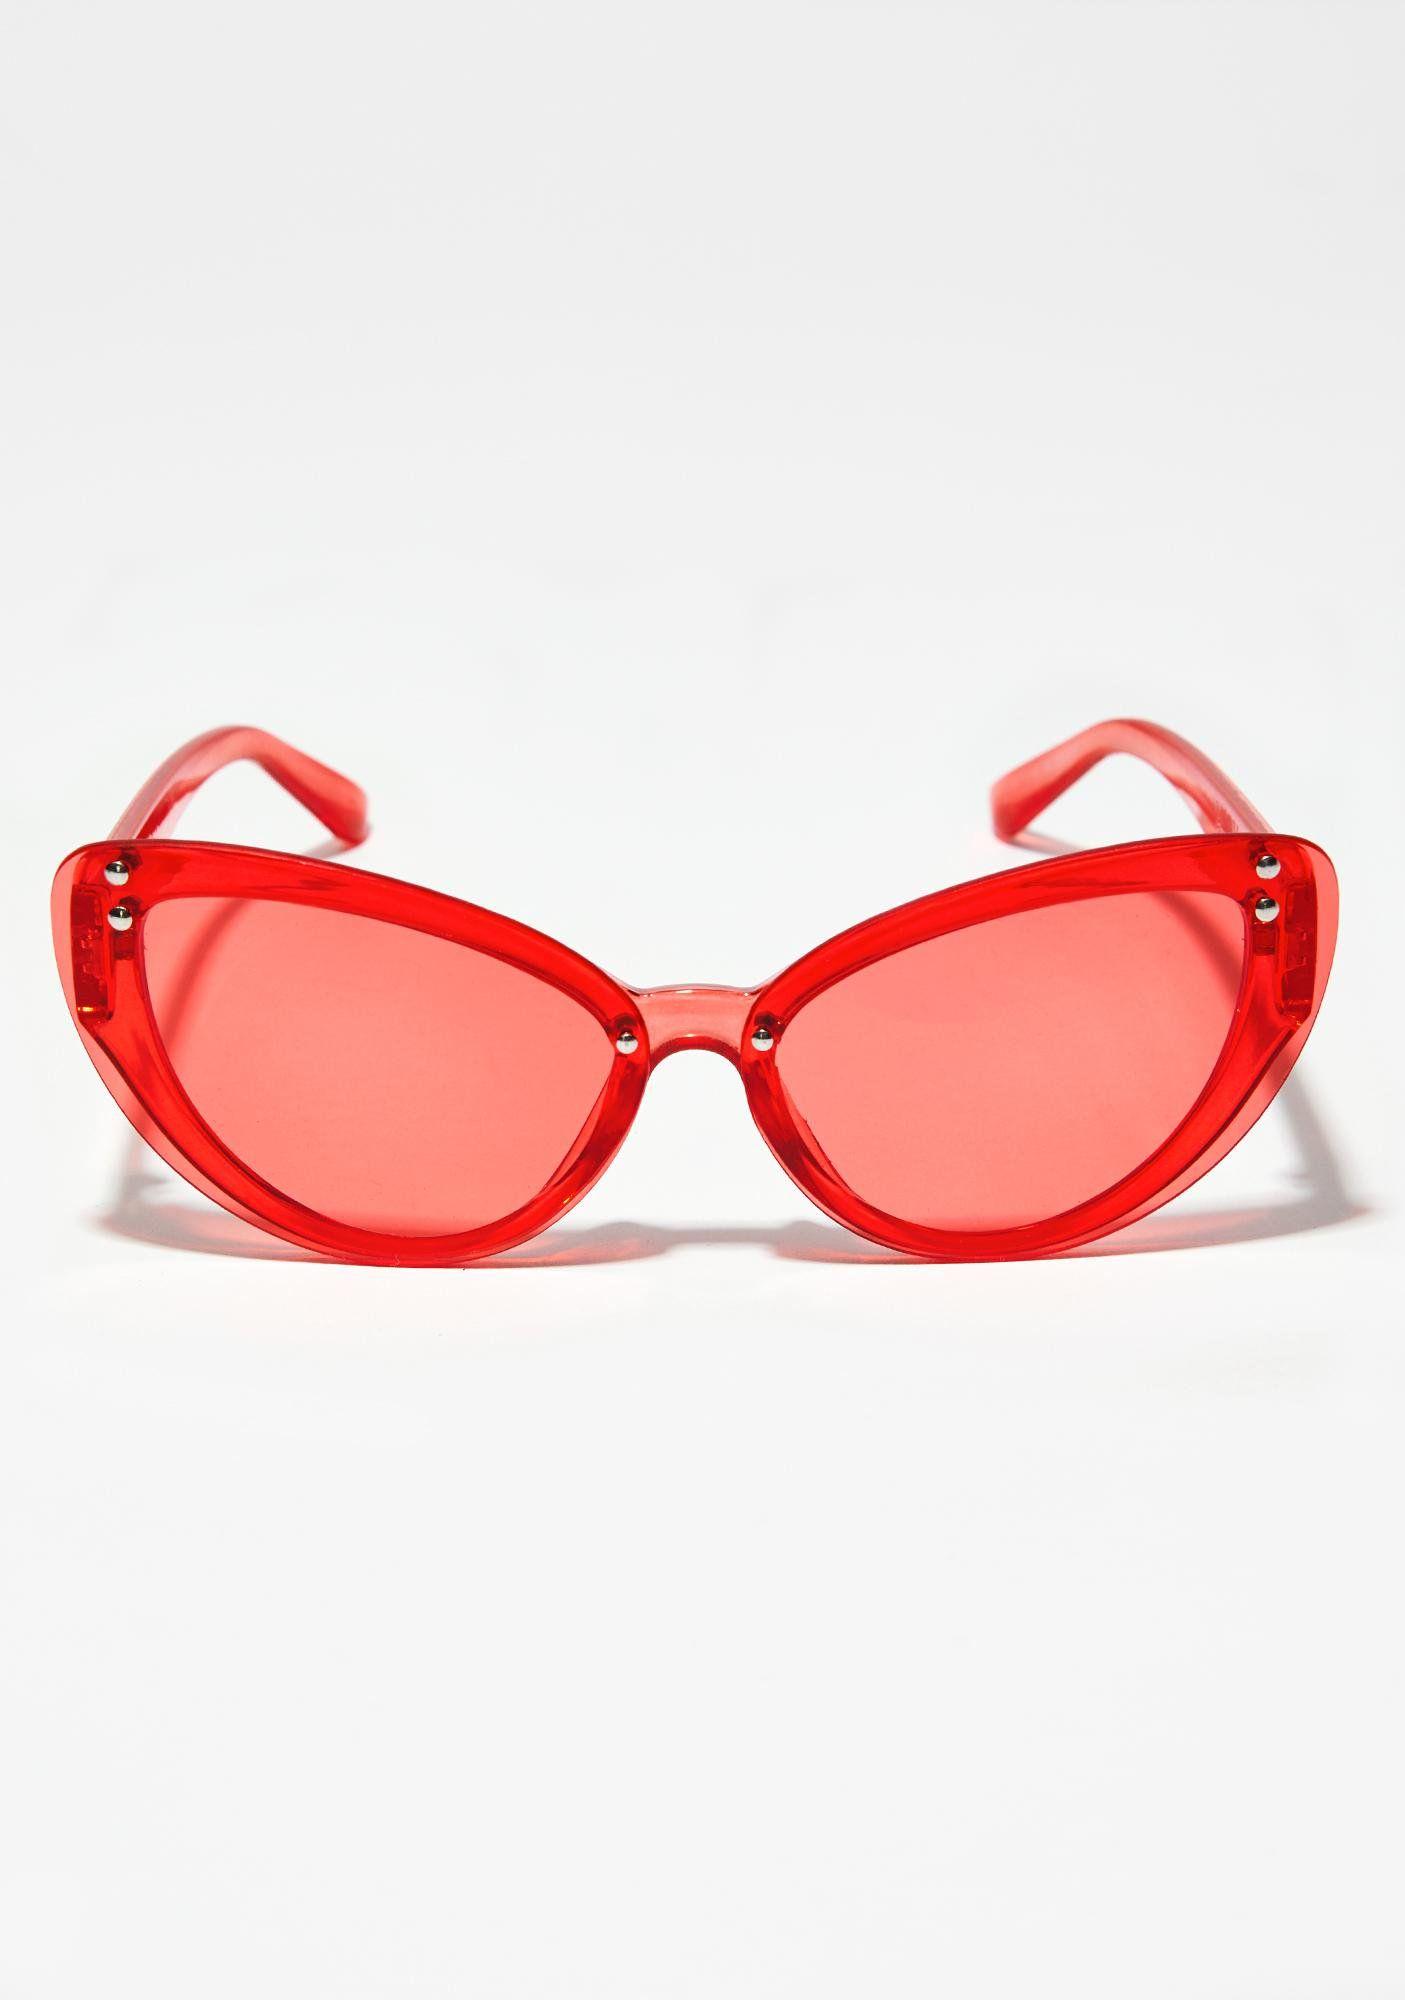 43fa3d32f1 Moth To A Flame Cat Eye Sunglasses in 2019